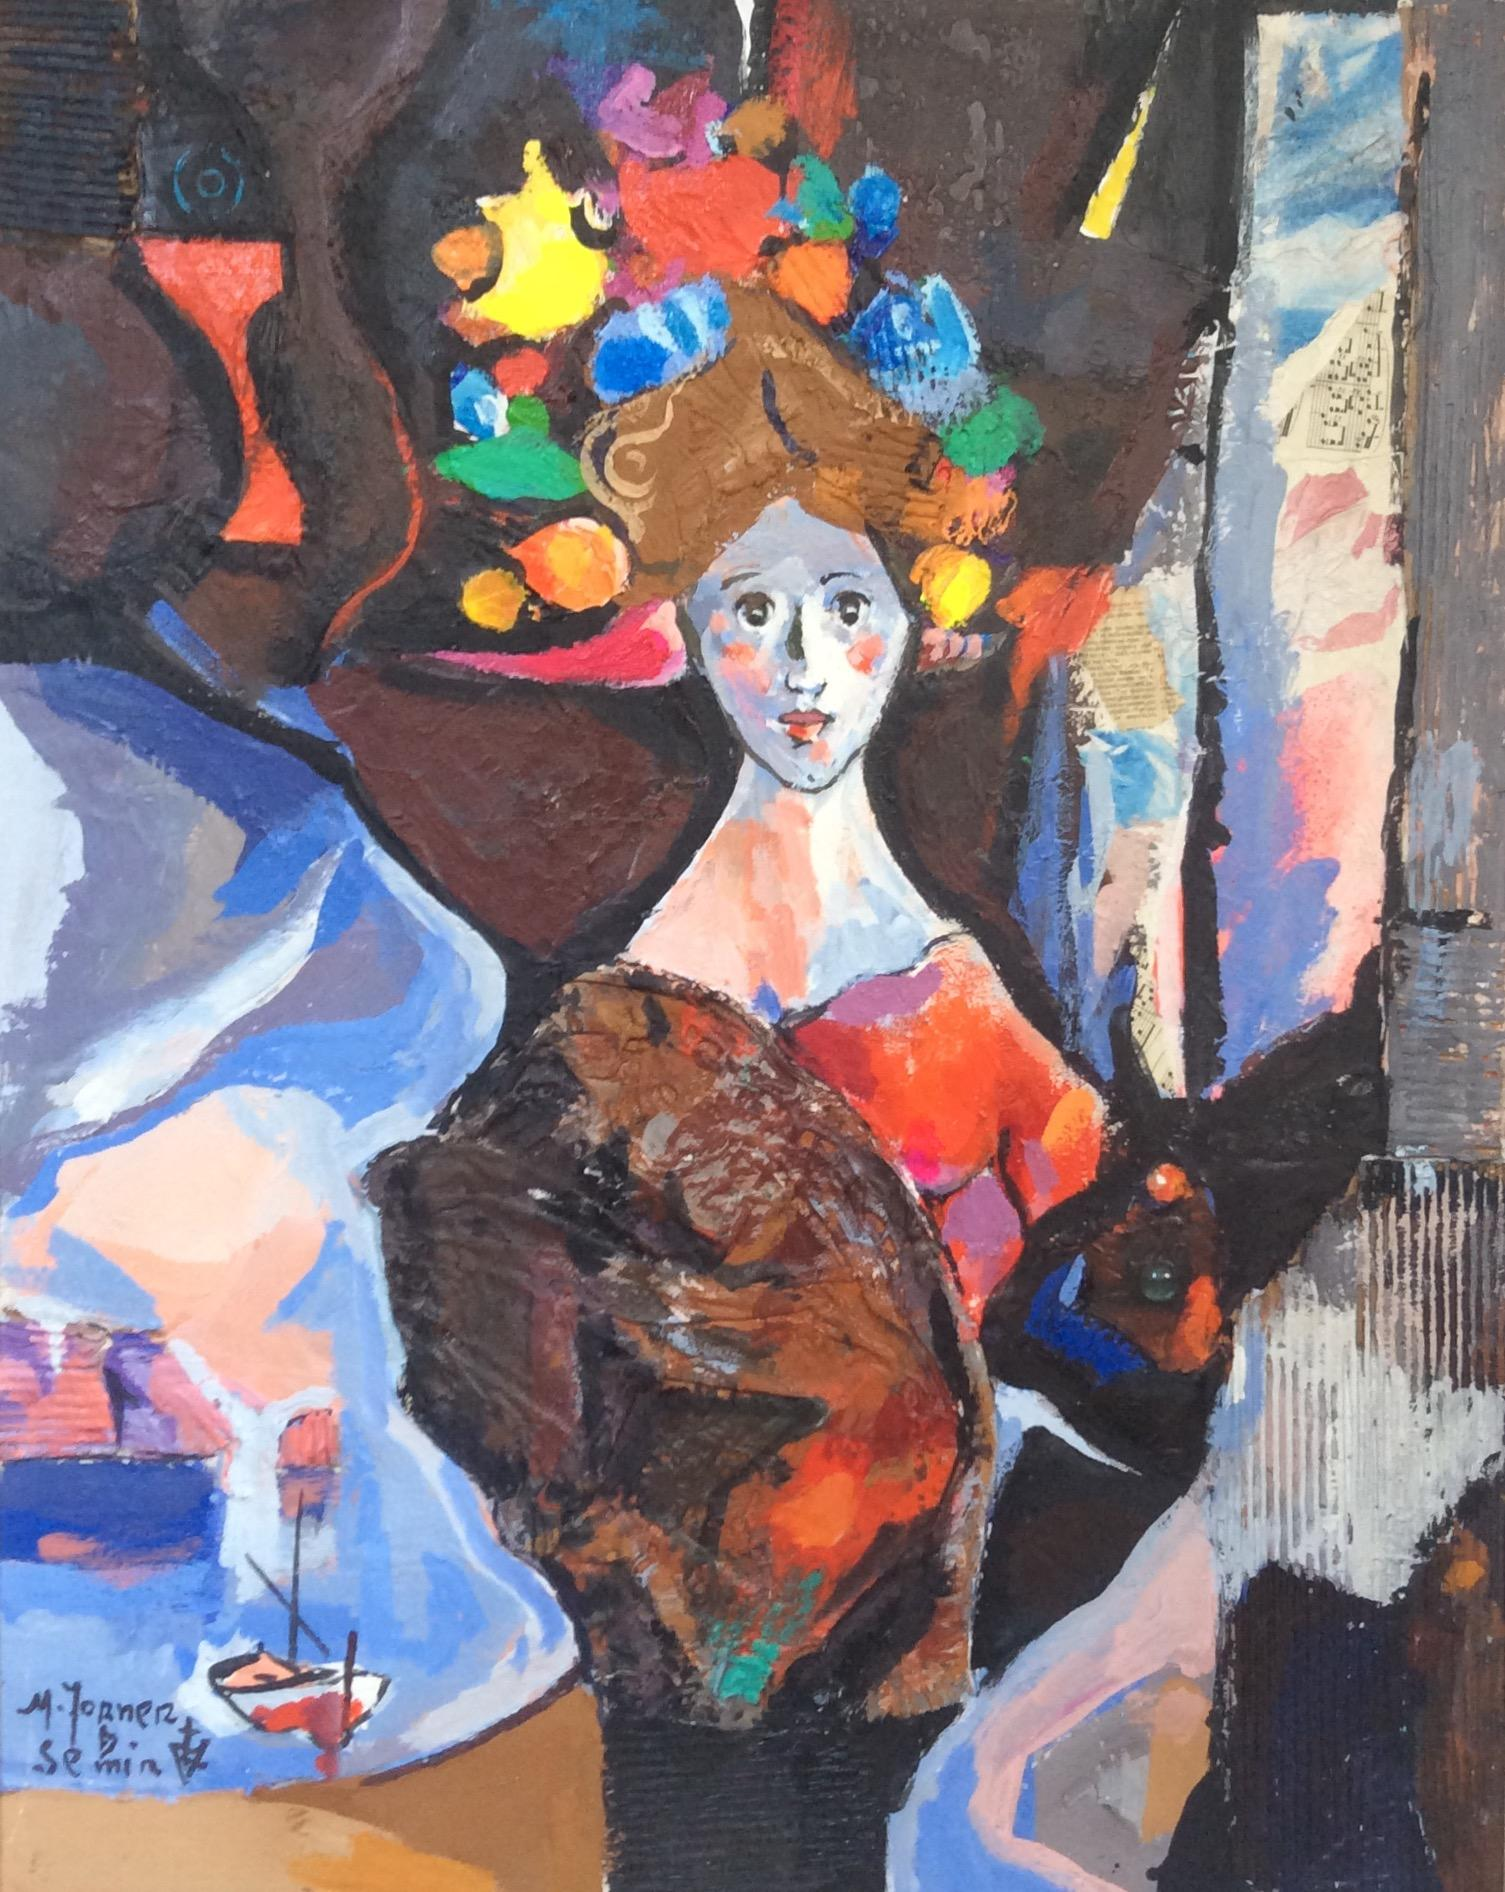 Woman & Boat,  Original Oil & Mixed Media on Canvas by Torner de Semir